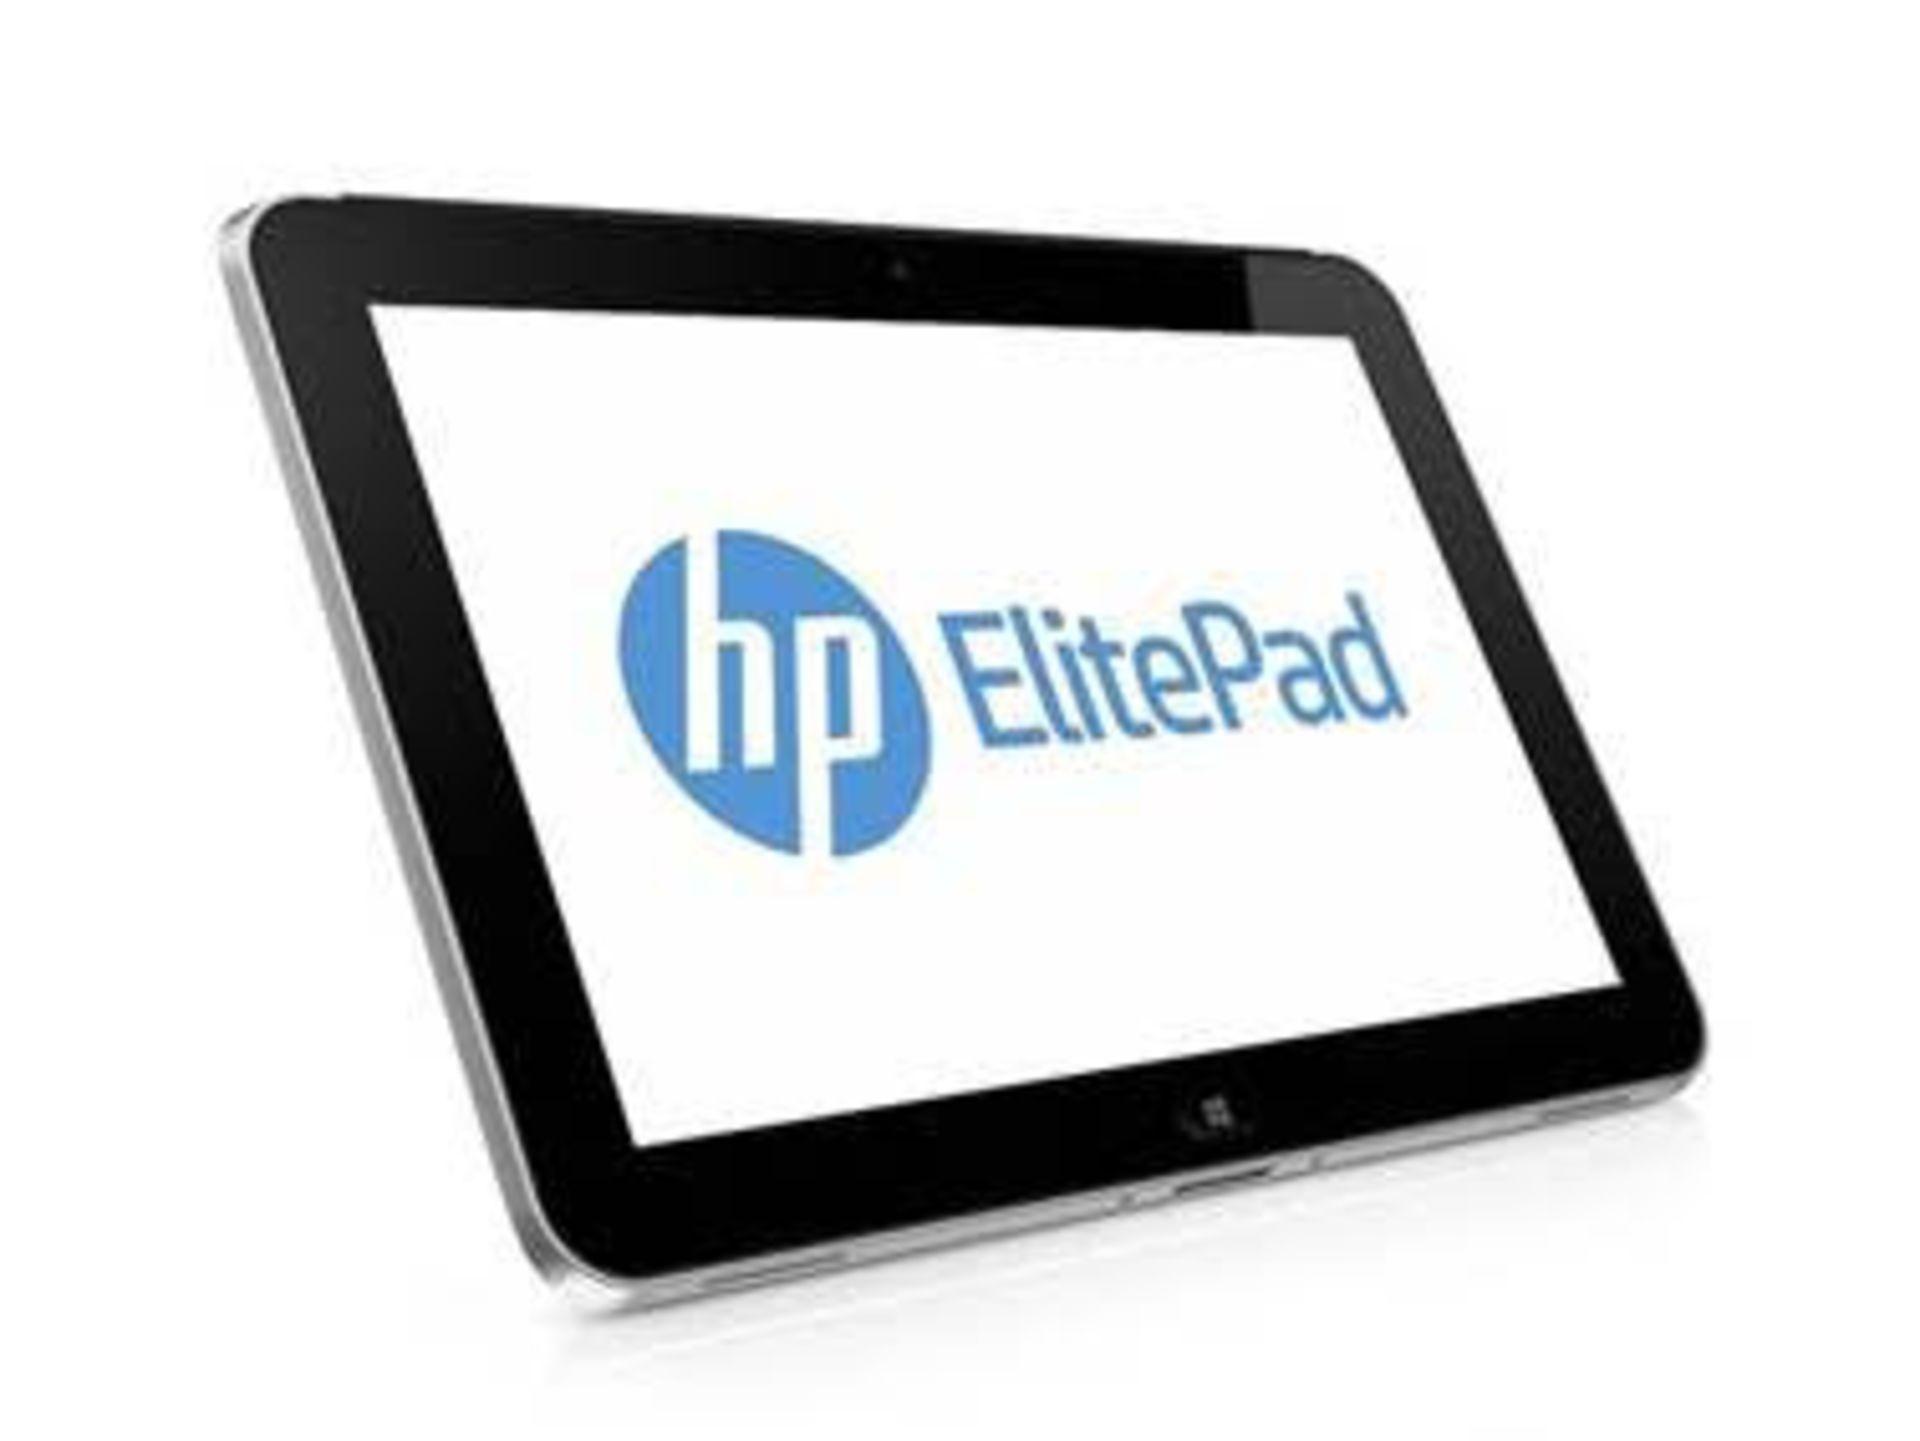 "V Grade A HP Elitepad 900 G1 Dual Core Tablet - Windows 10 Pro - 2gb RAM - 64GB SSD - 10"" Screen"